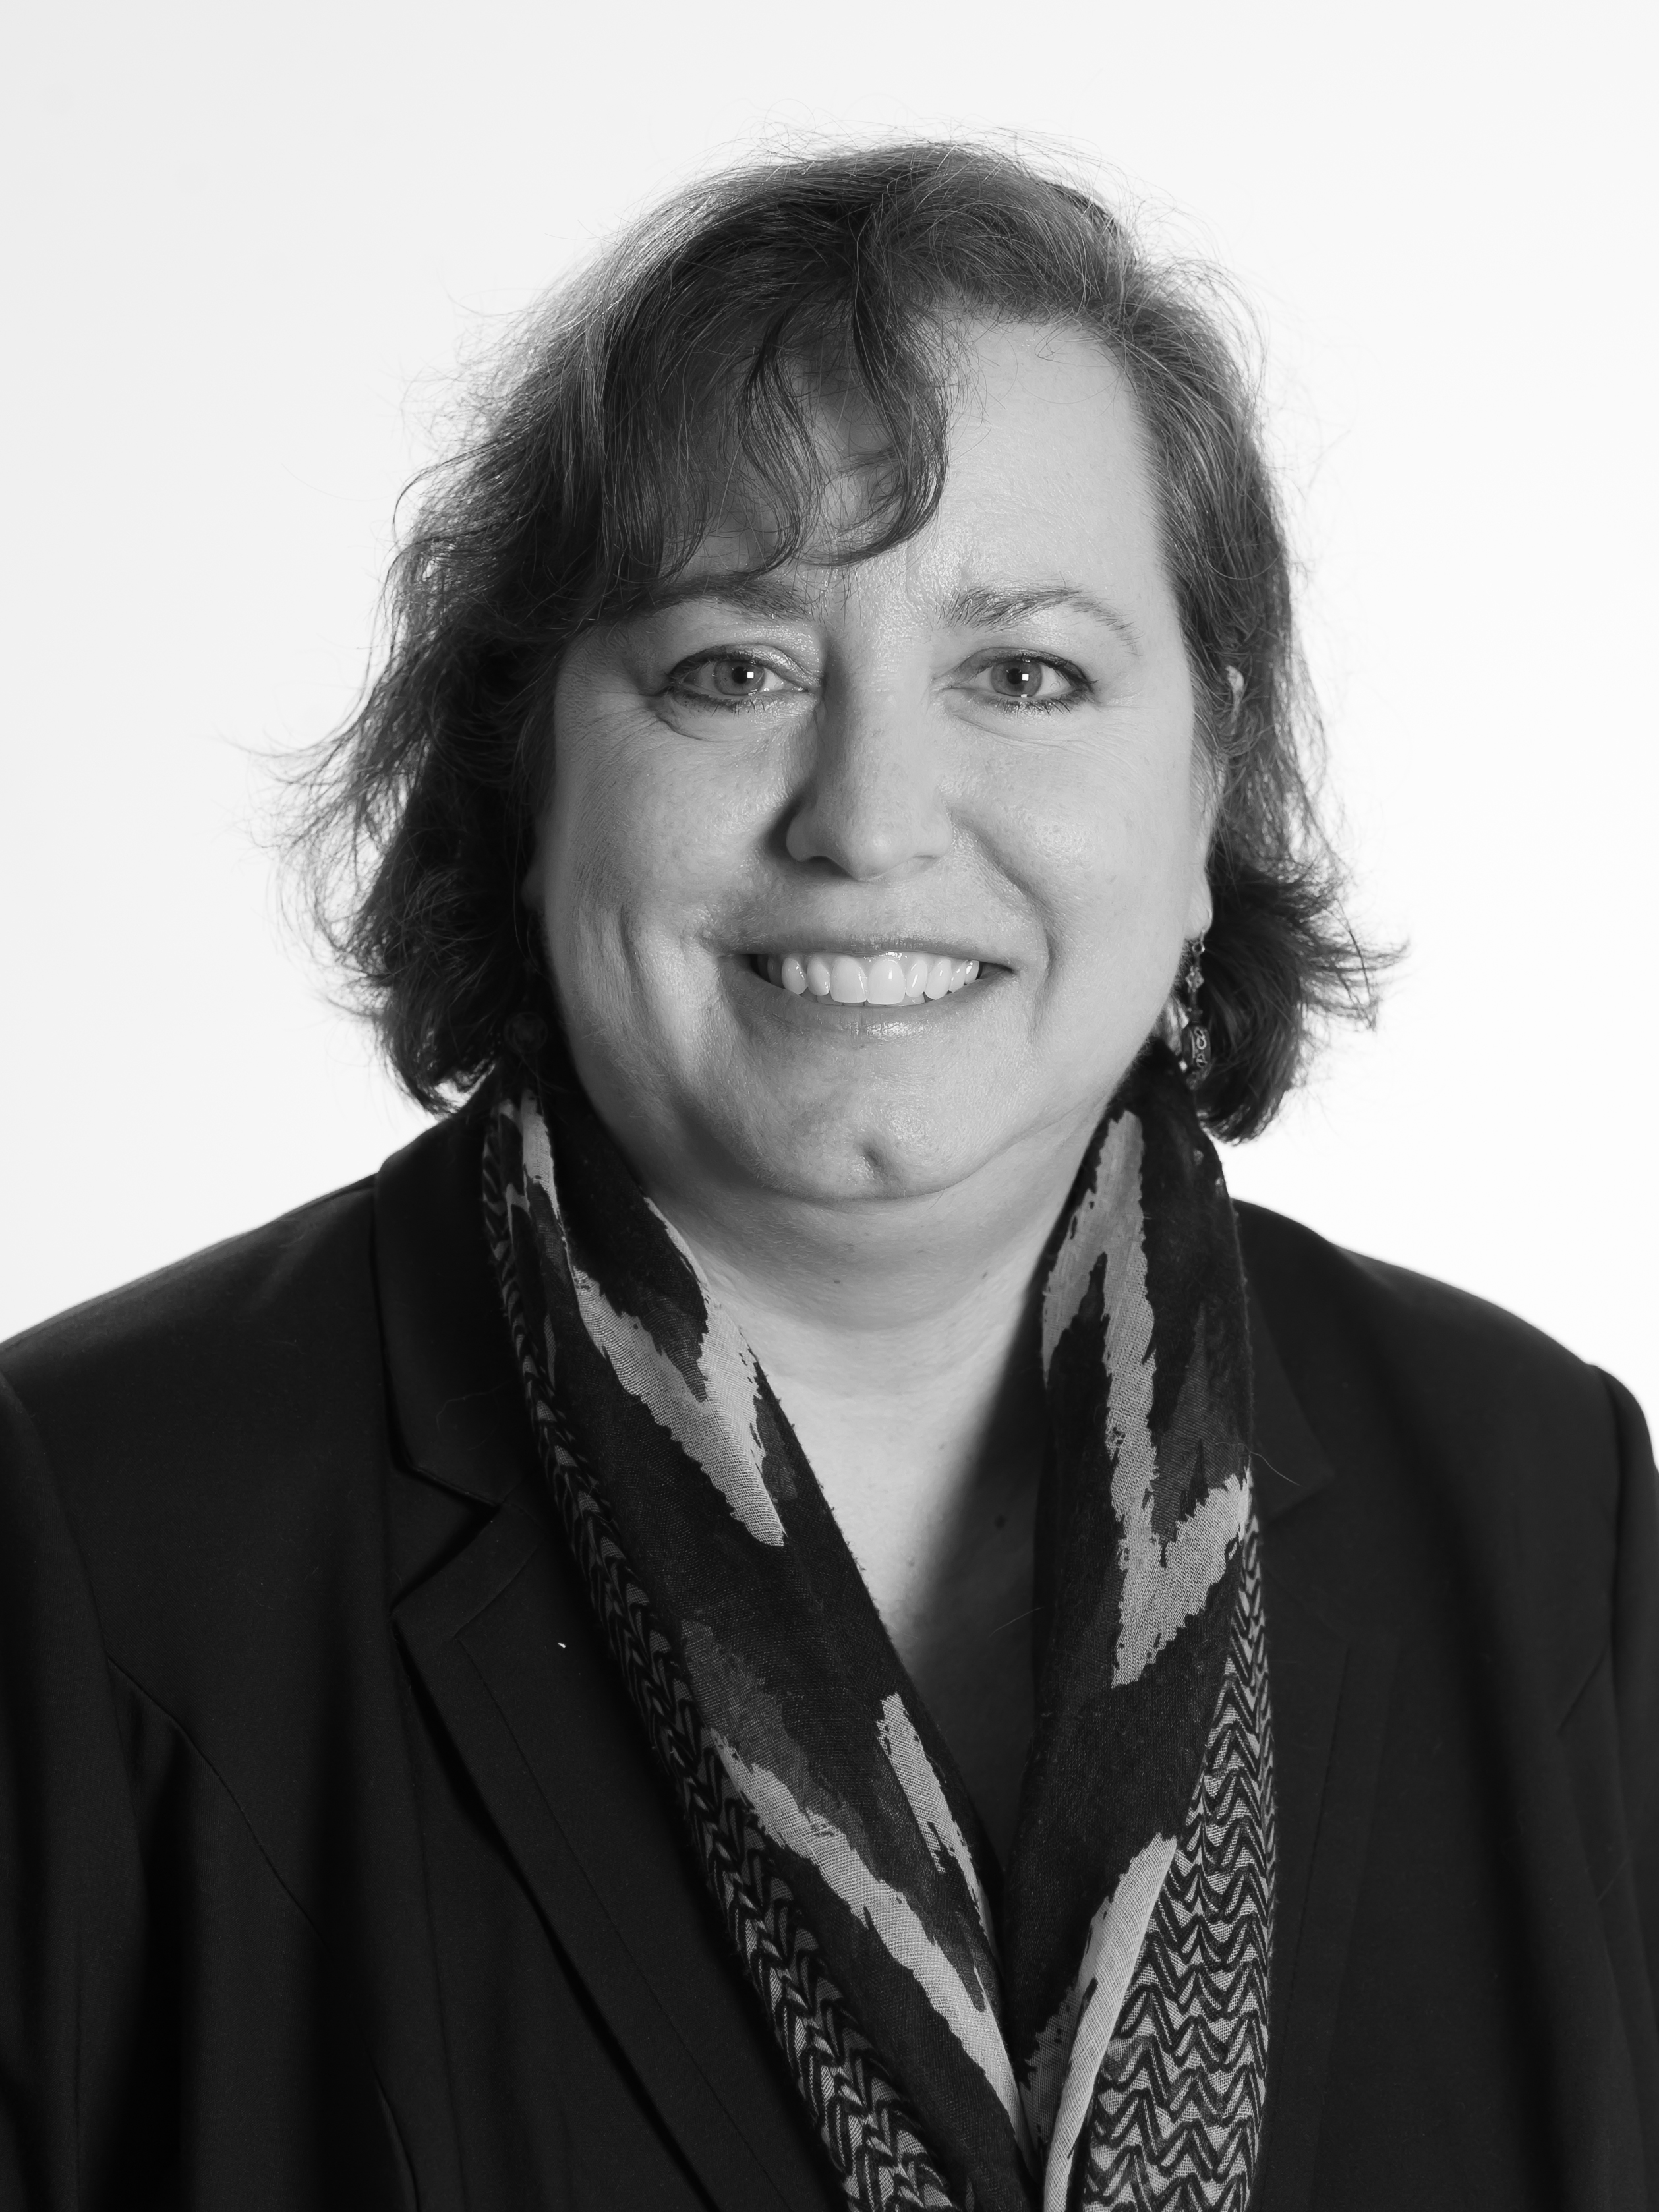 Melissa G. Beach